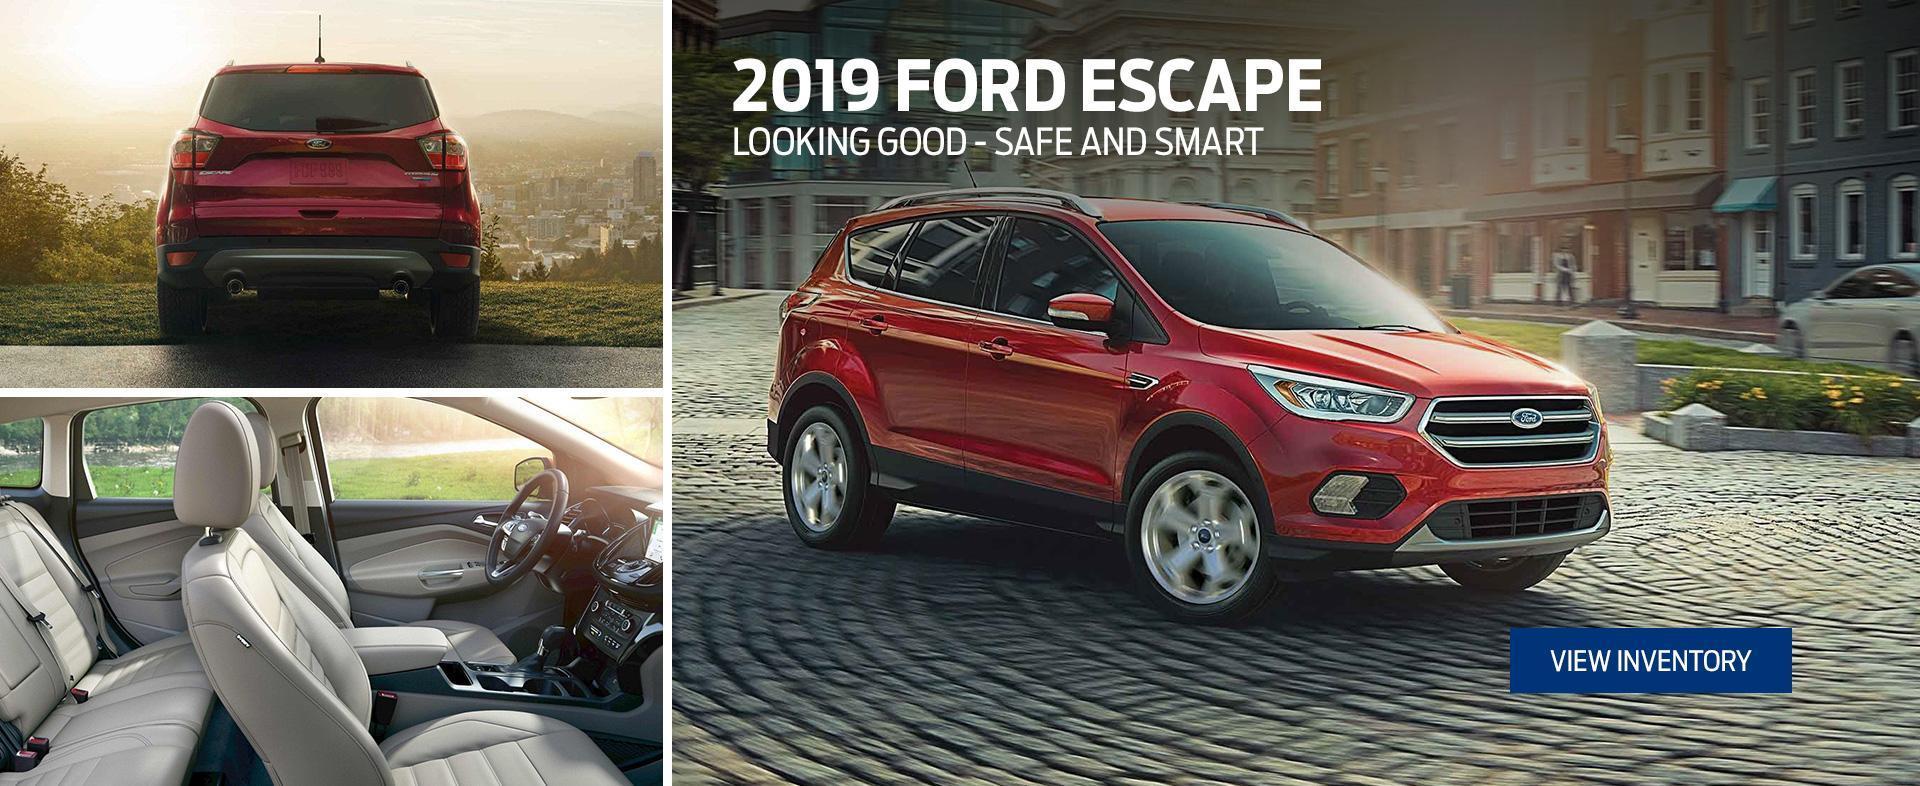 Ford Home 2019 Ford Escape